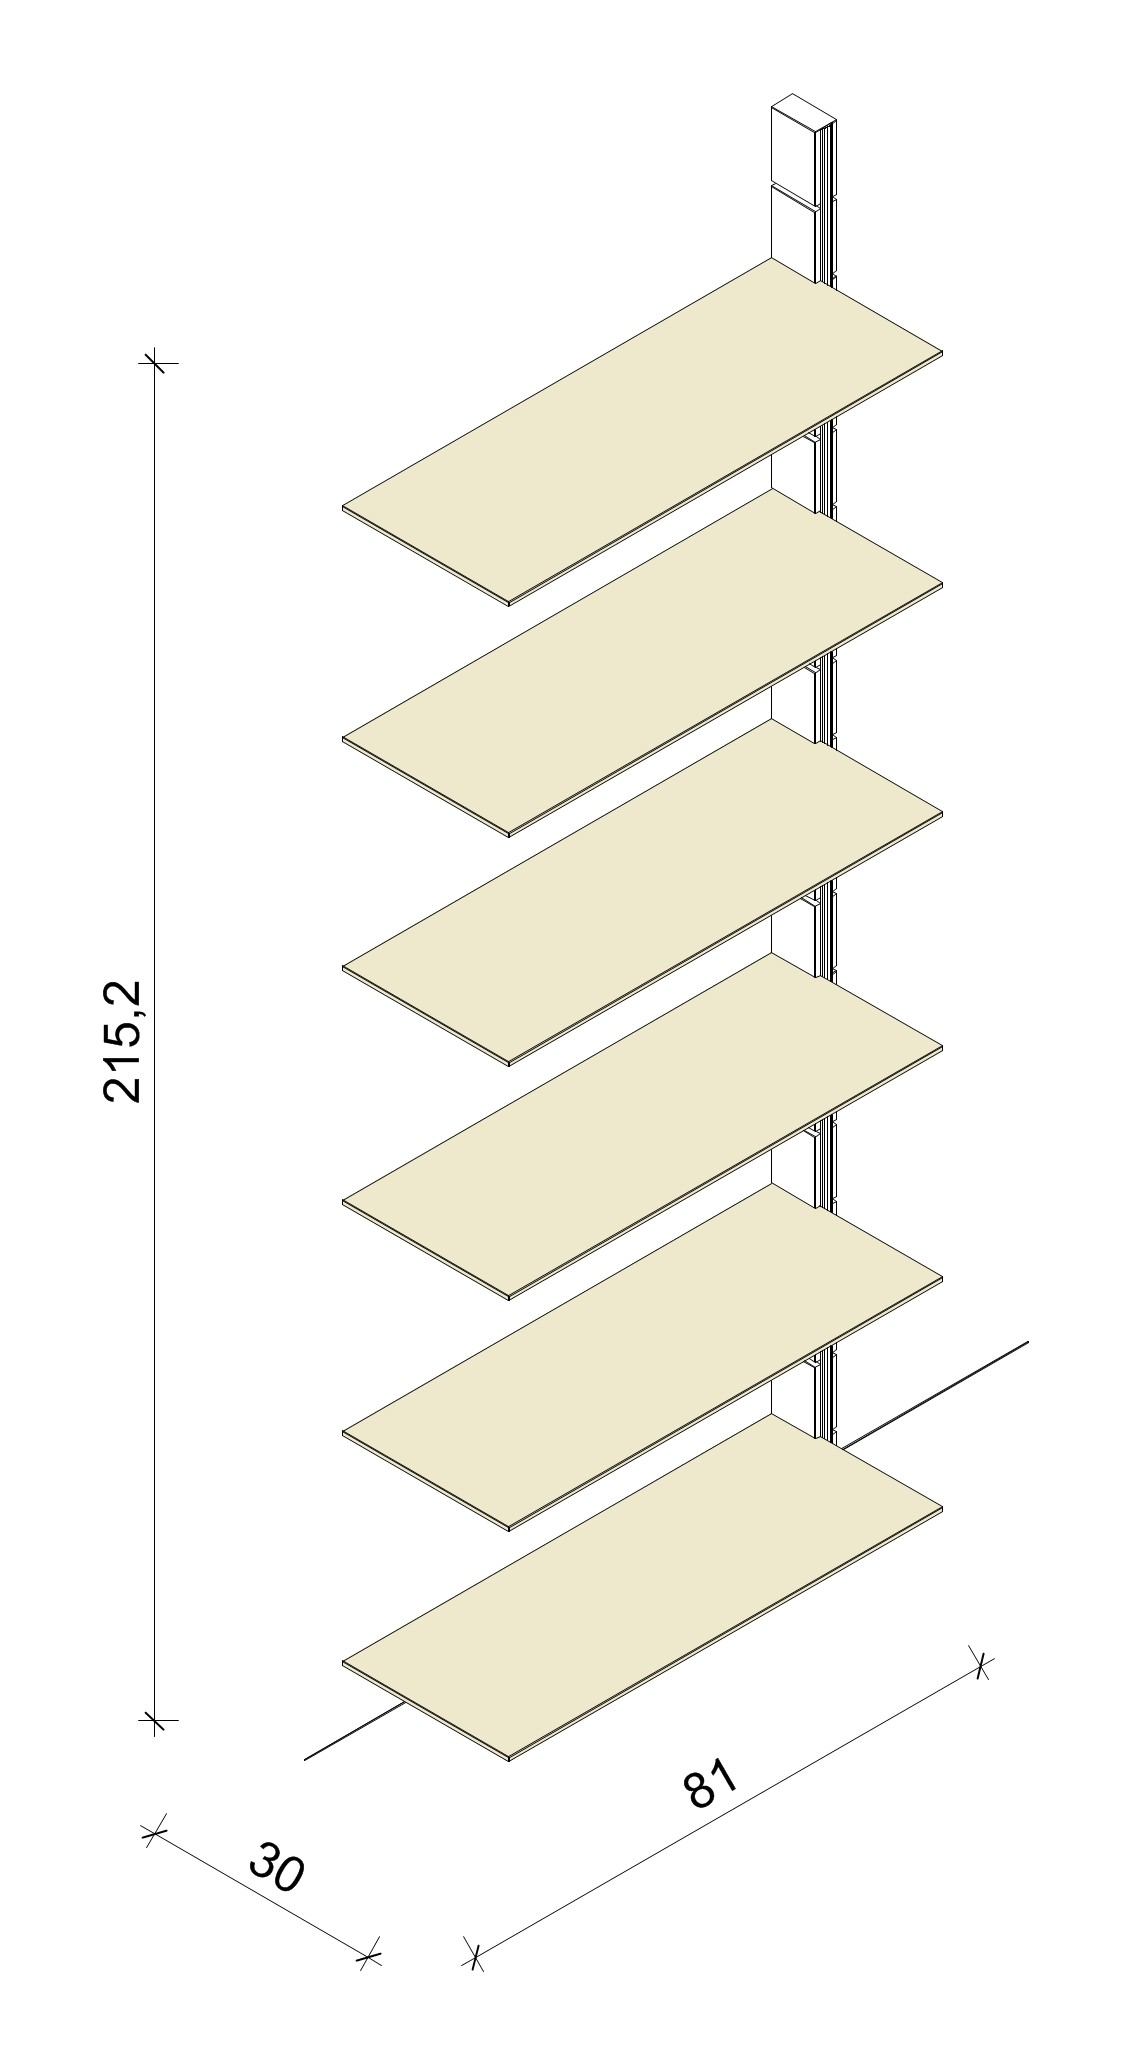 Bücherregal - Prime (XL) 81 - Anbauelement -Maß: 81 x 215,2 x 30 cm (B x H x T)